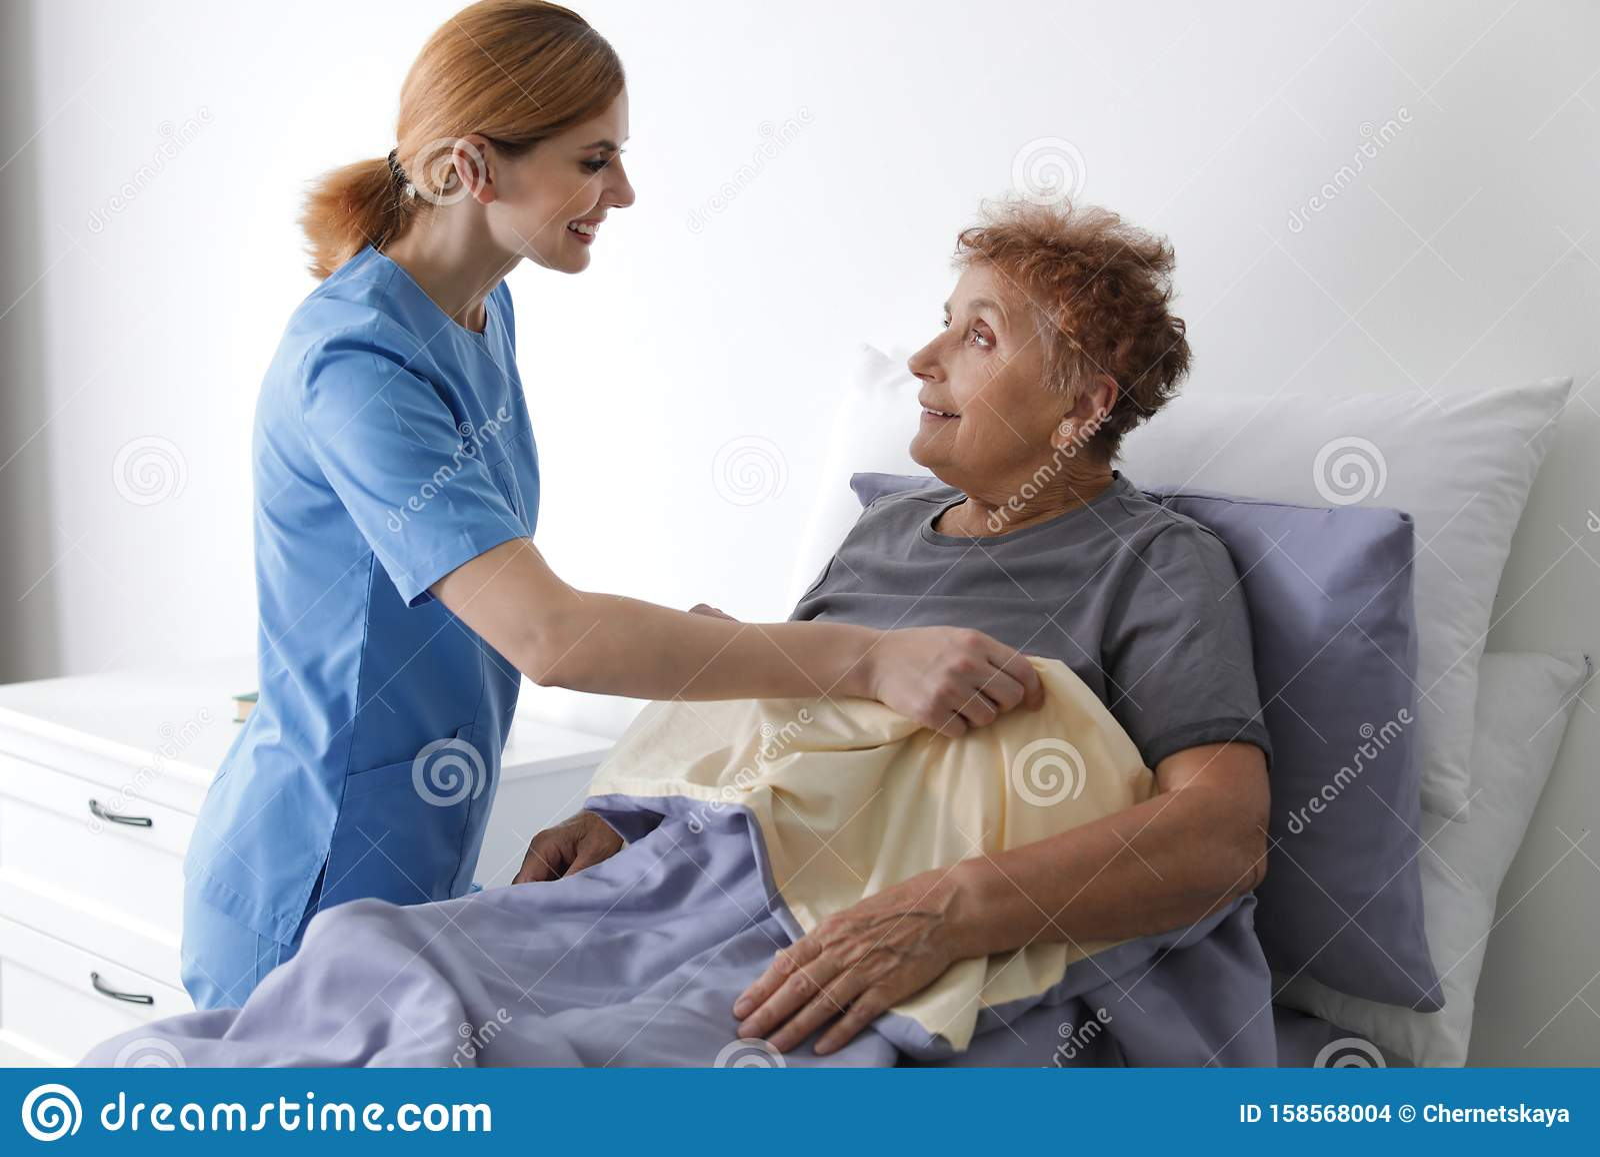 Nurse assisting elderly woman in bed